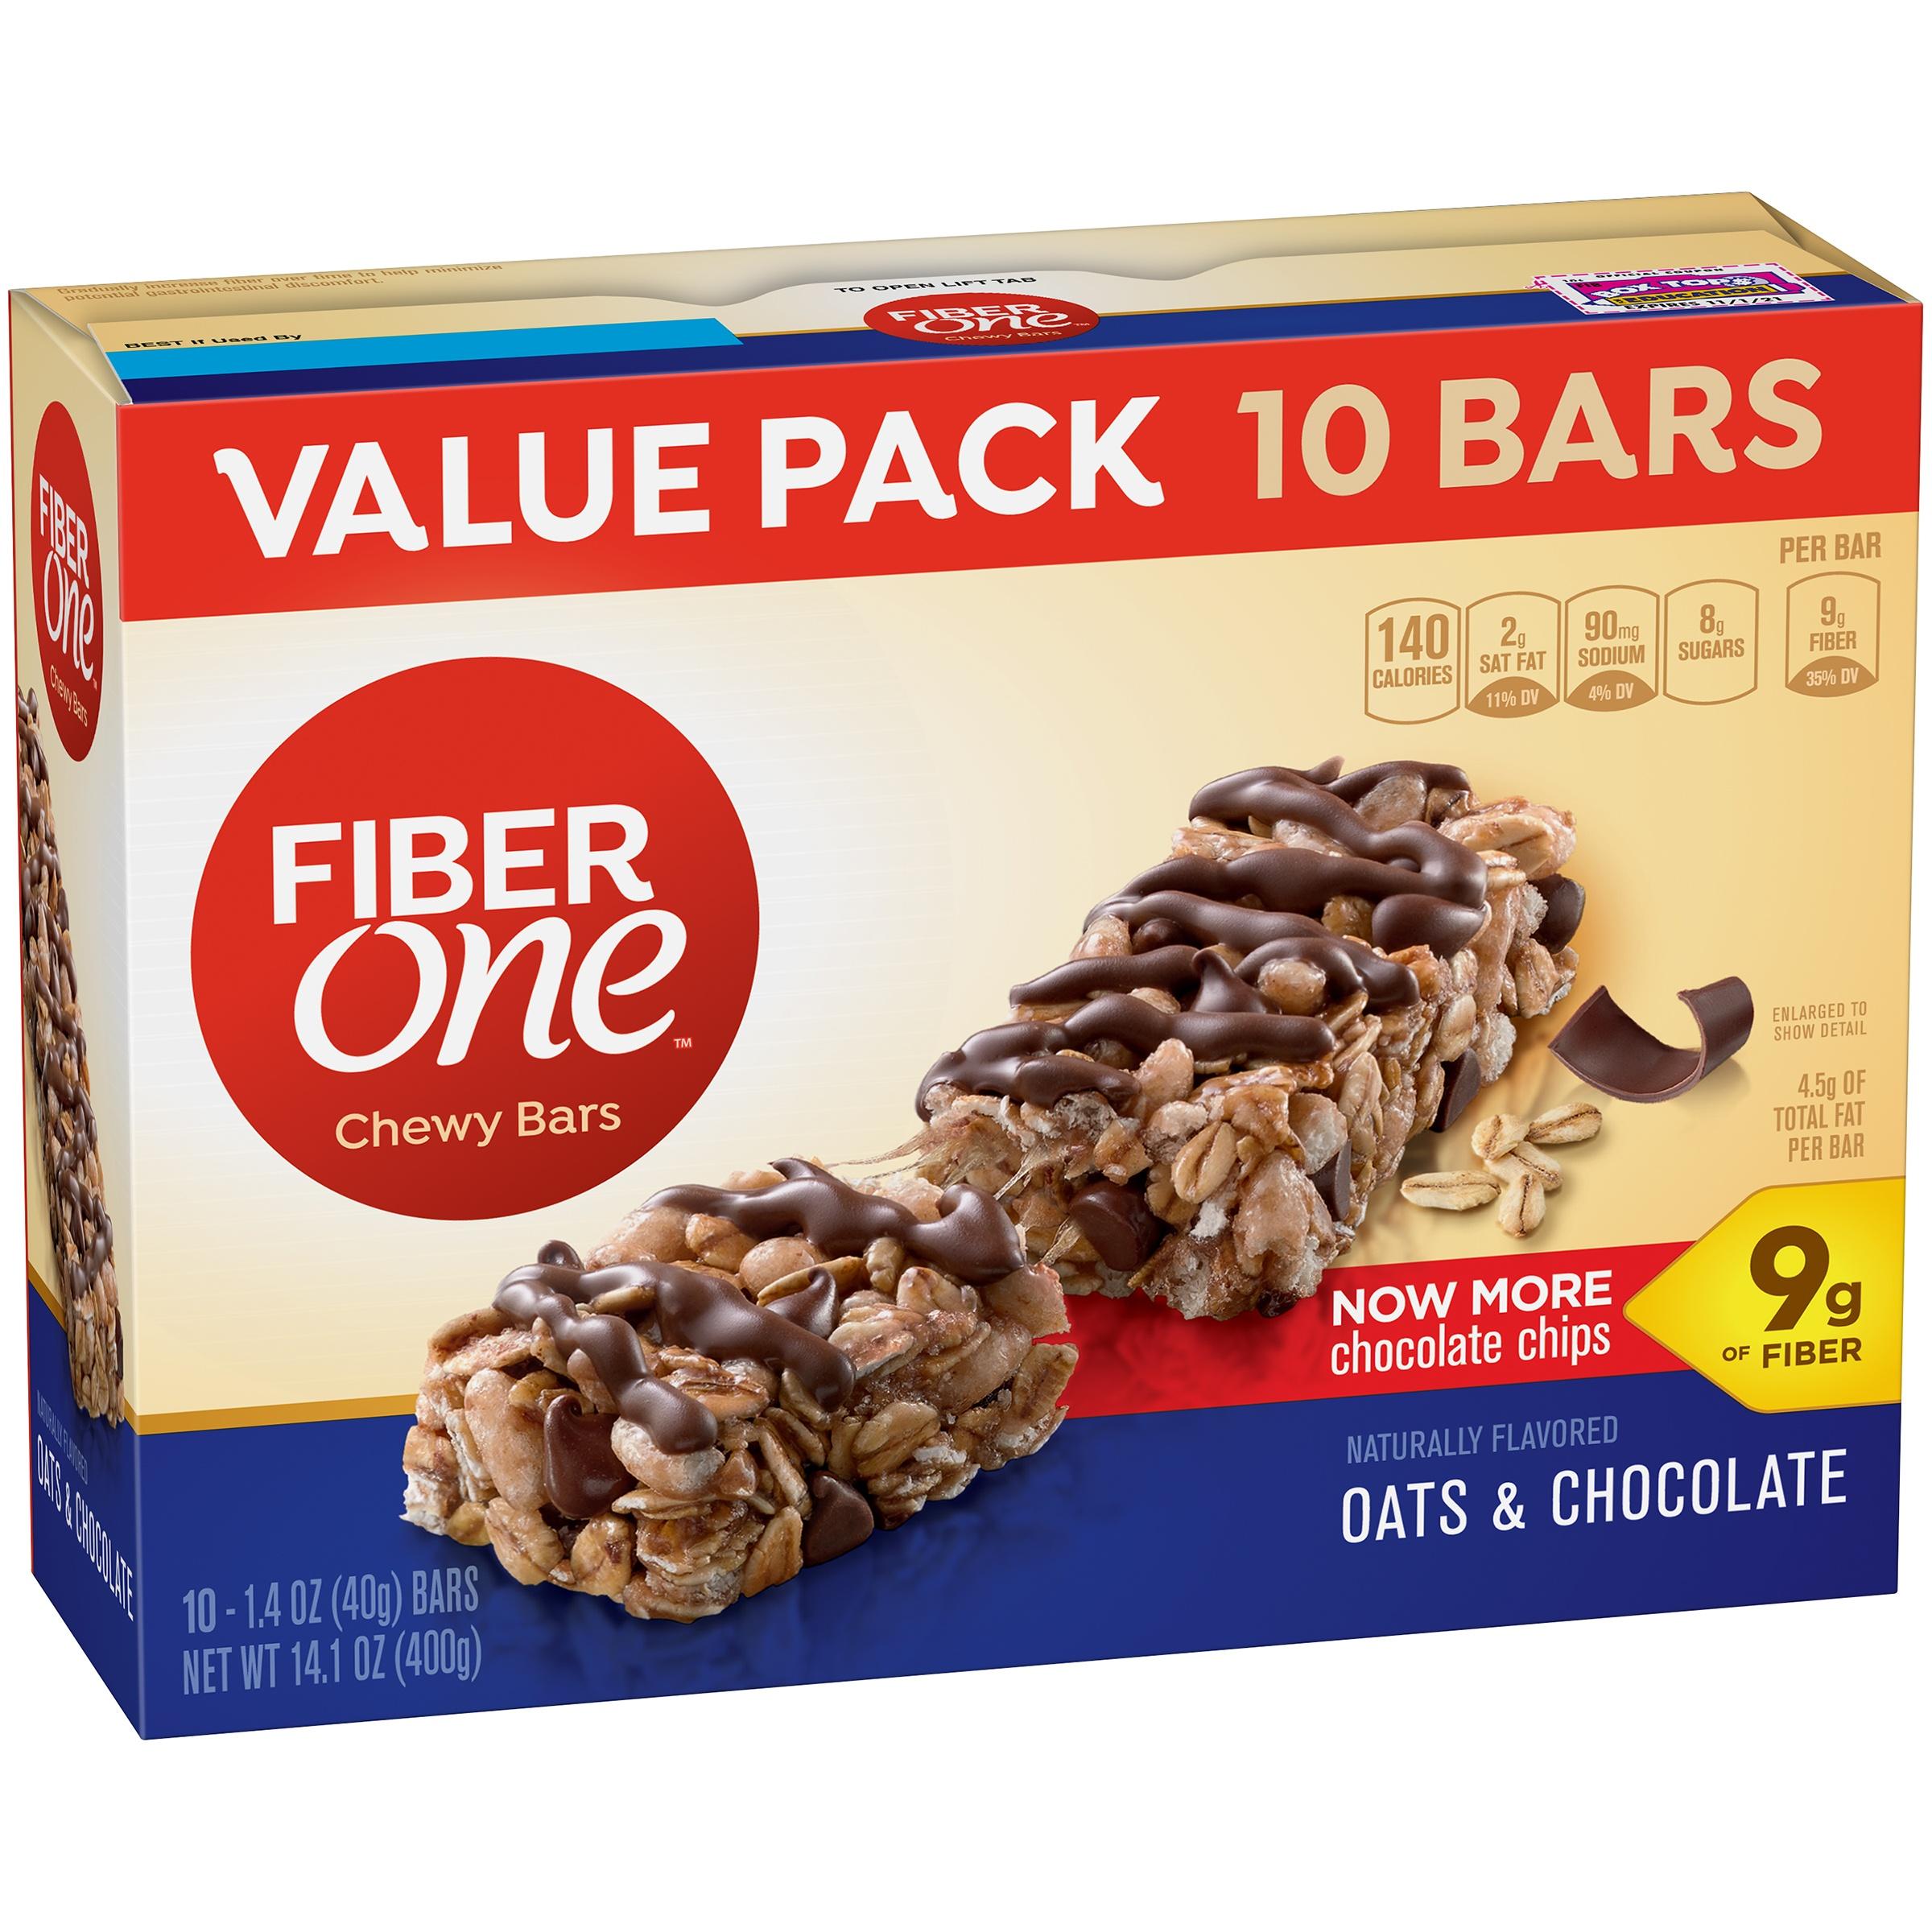 Fiber One Bar Oats and Chocolate 1.4 oz Bars 10 ct Box